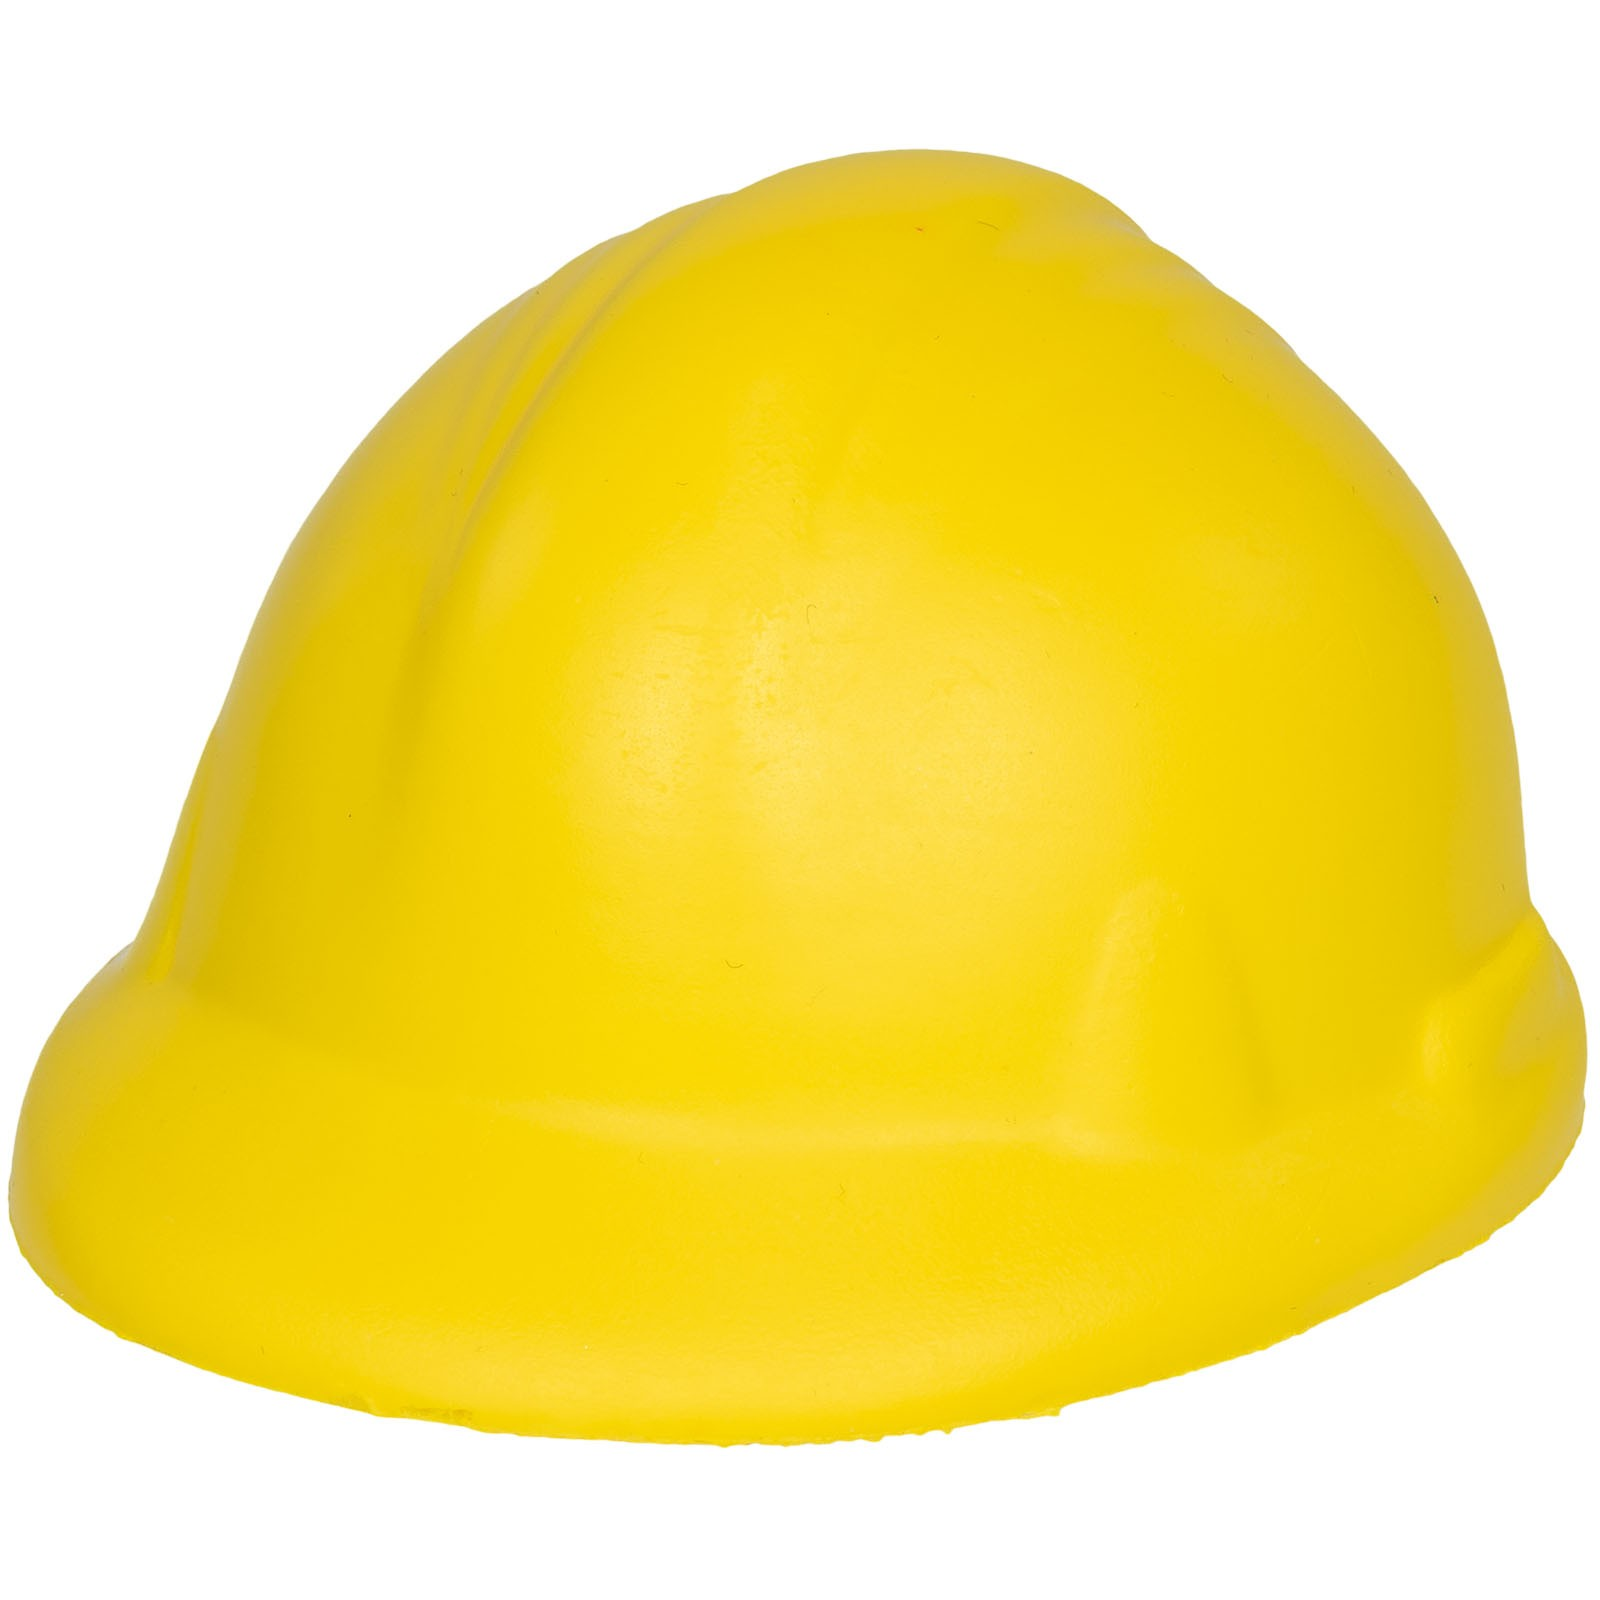 Sara hard hat stress reliever - Yellow